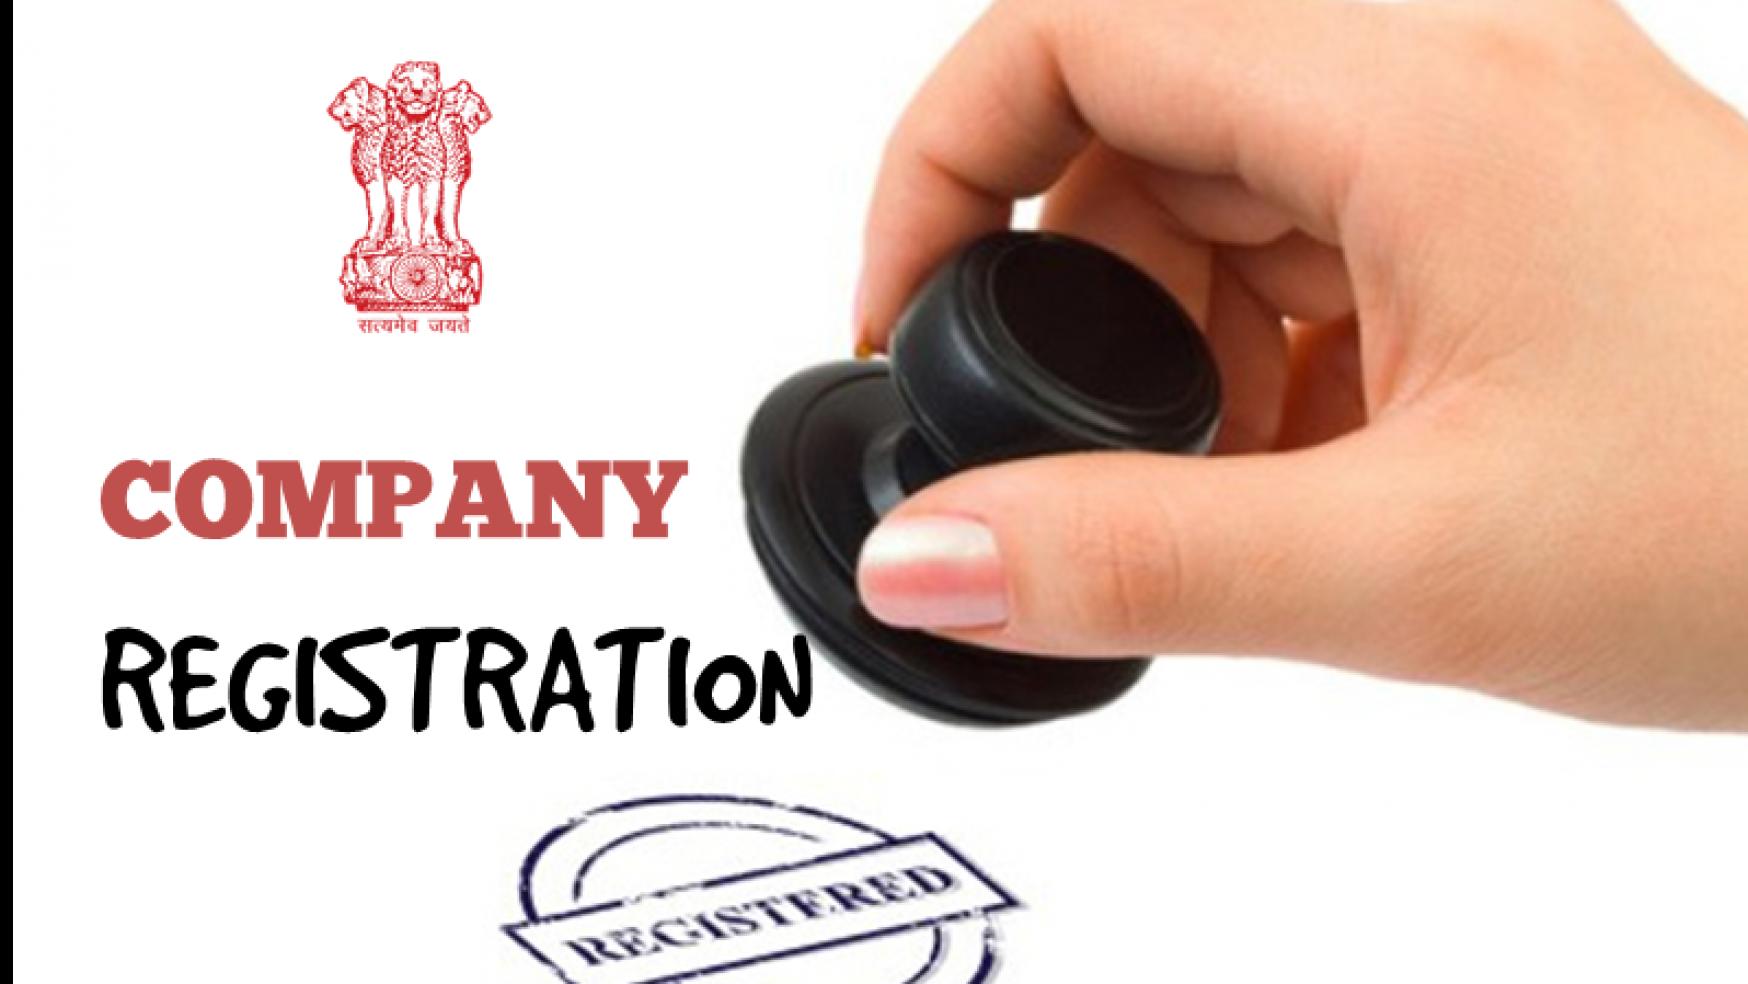 Company-Registration-1748x984-2